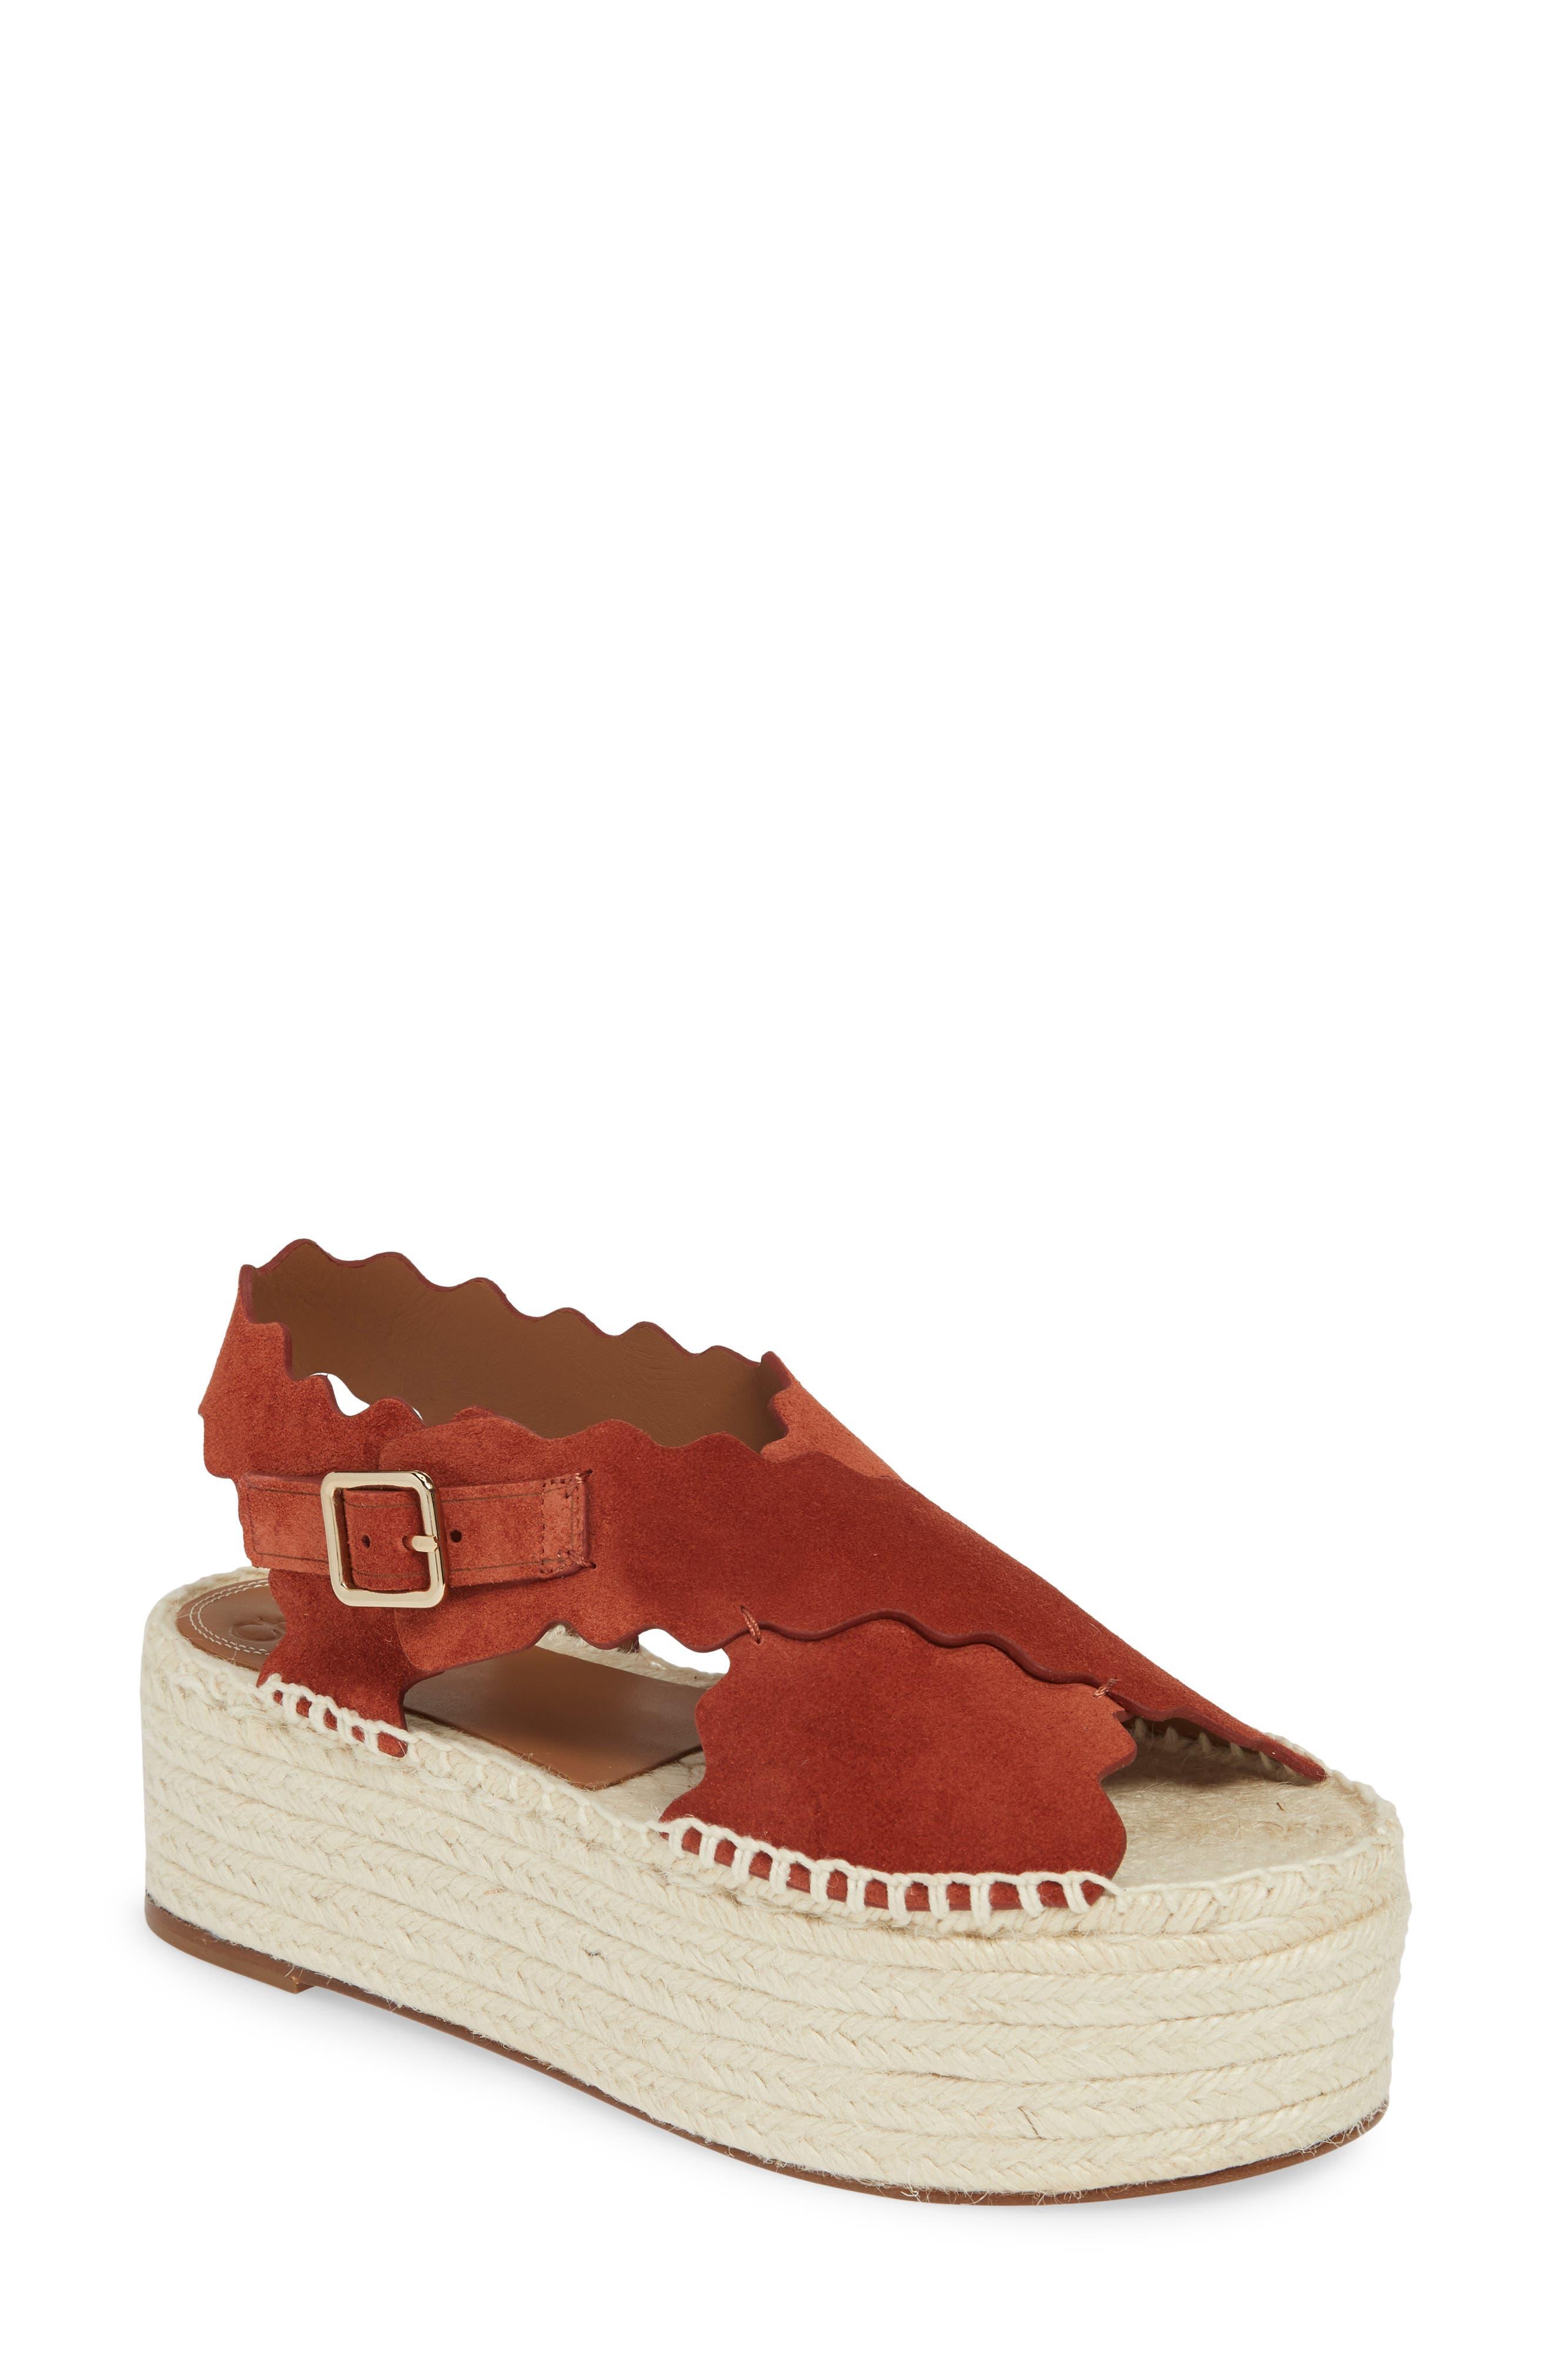 CHLOÉ Lauren Scalloped Flatform Sandal, Main, color, EARTHY RED